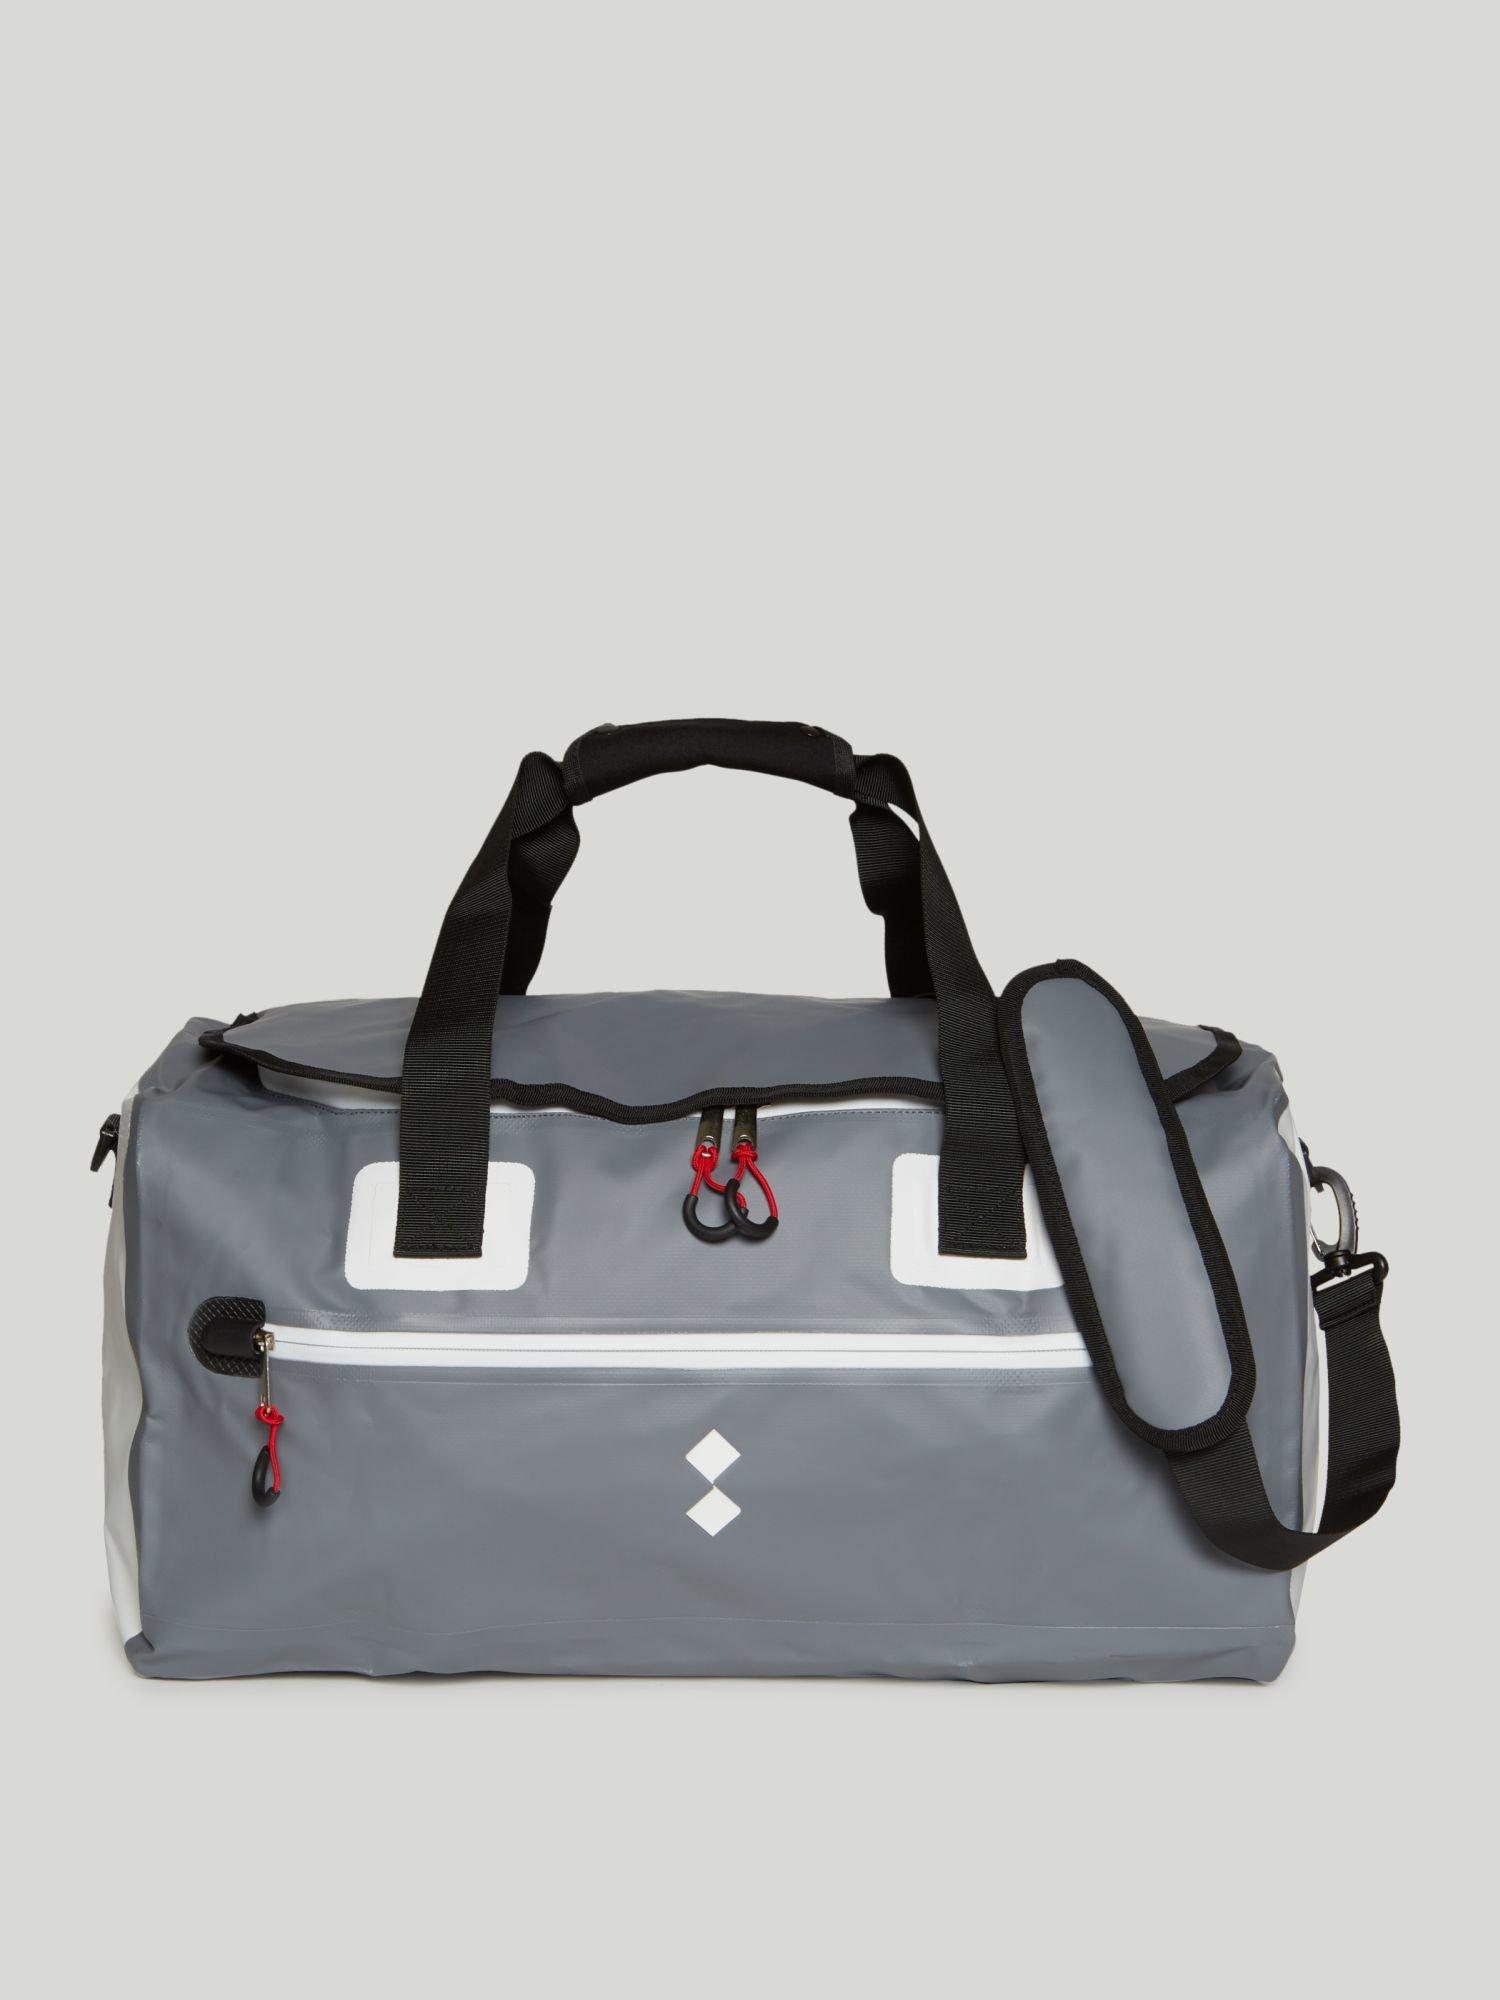 Evolution 4 bag - Shark Grey